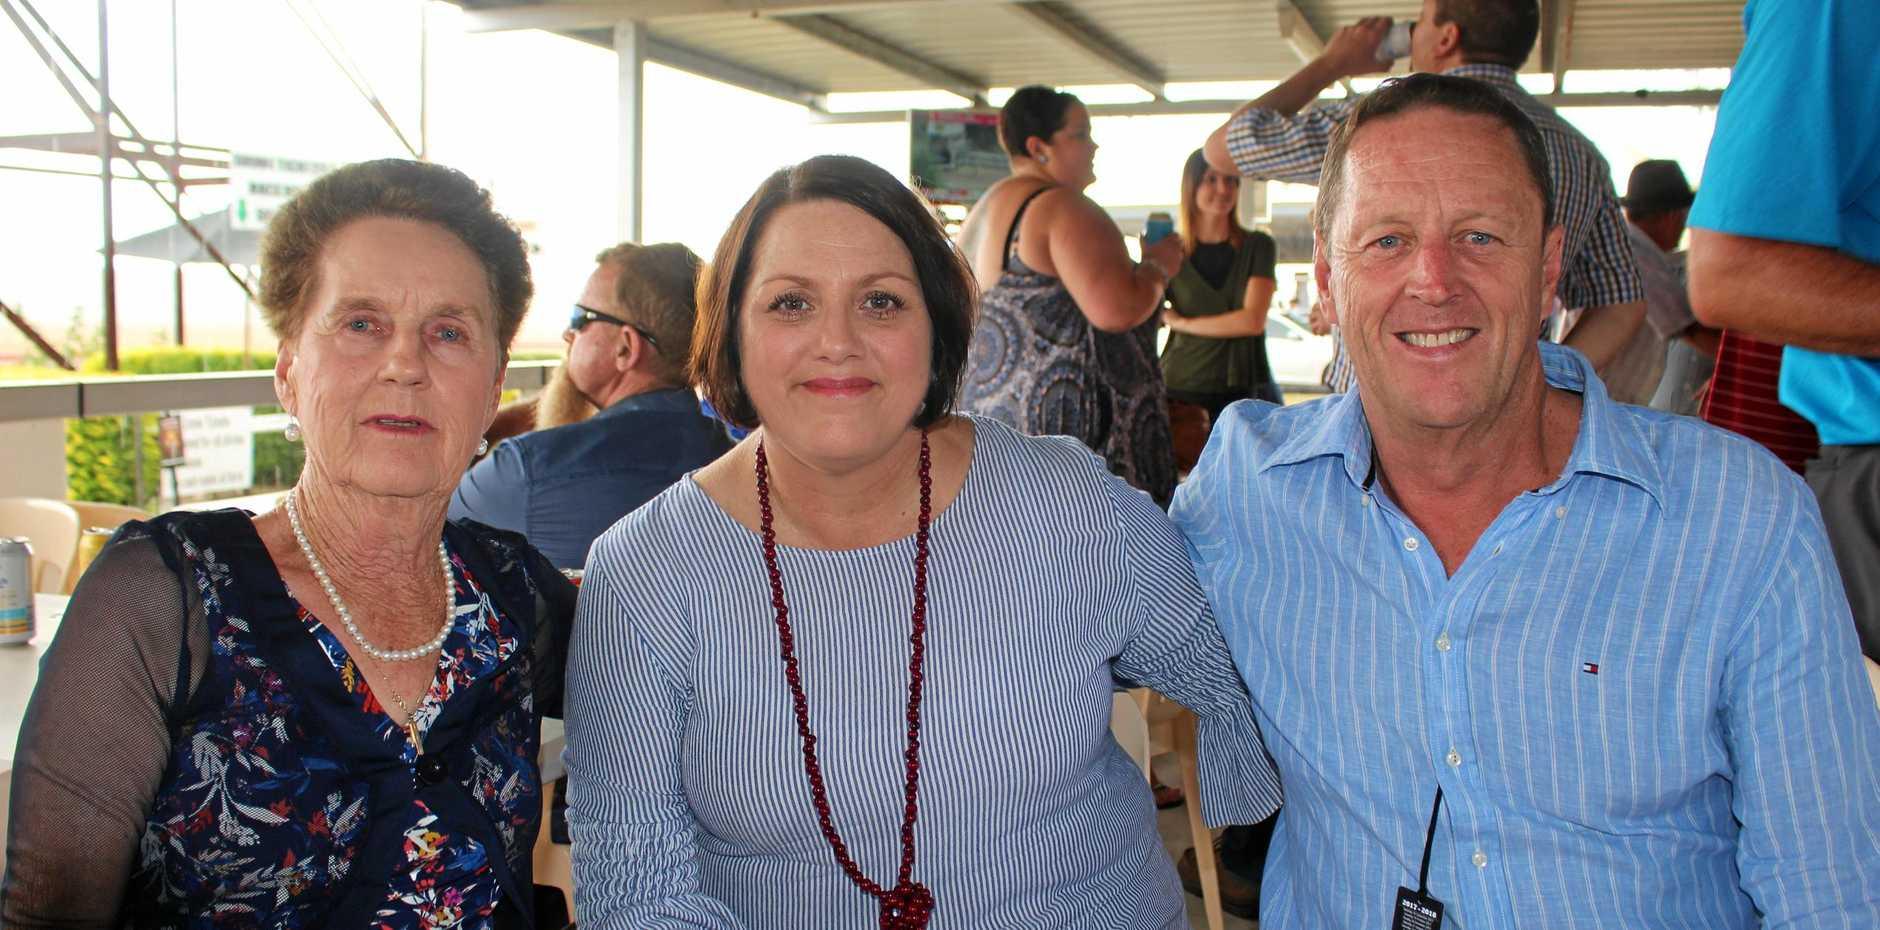 Venie Watt, Belinda Fenton and Garry Watt at the memorial race meeting at Allman Park on Saturday.